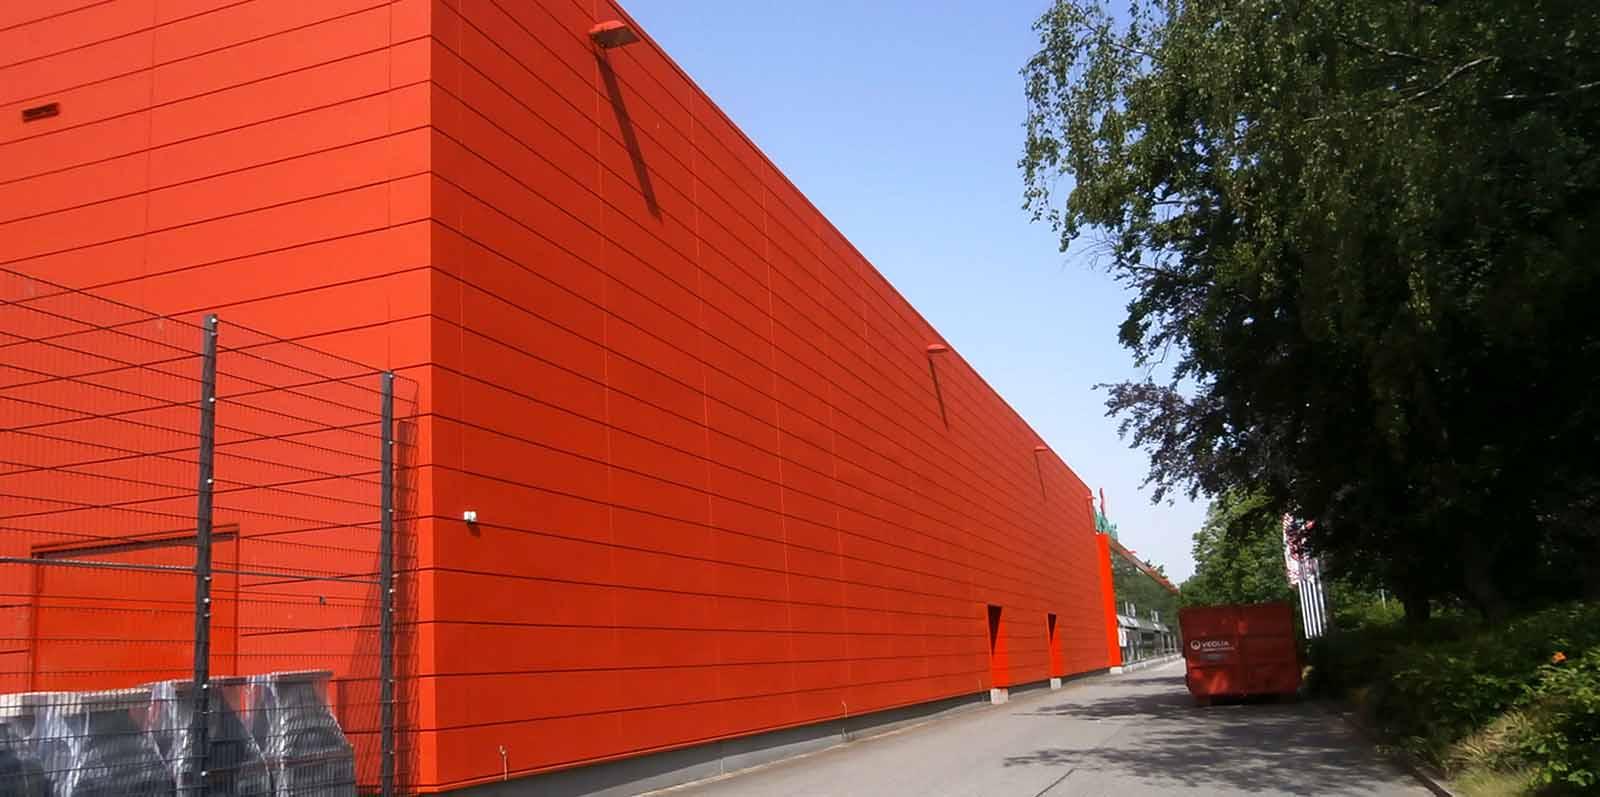 Bauhaus Hamburg Stelling